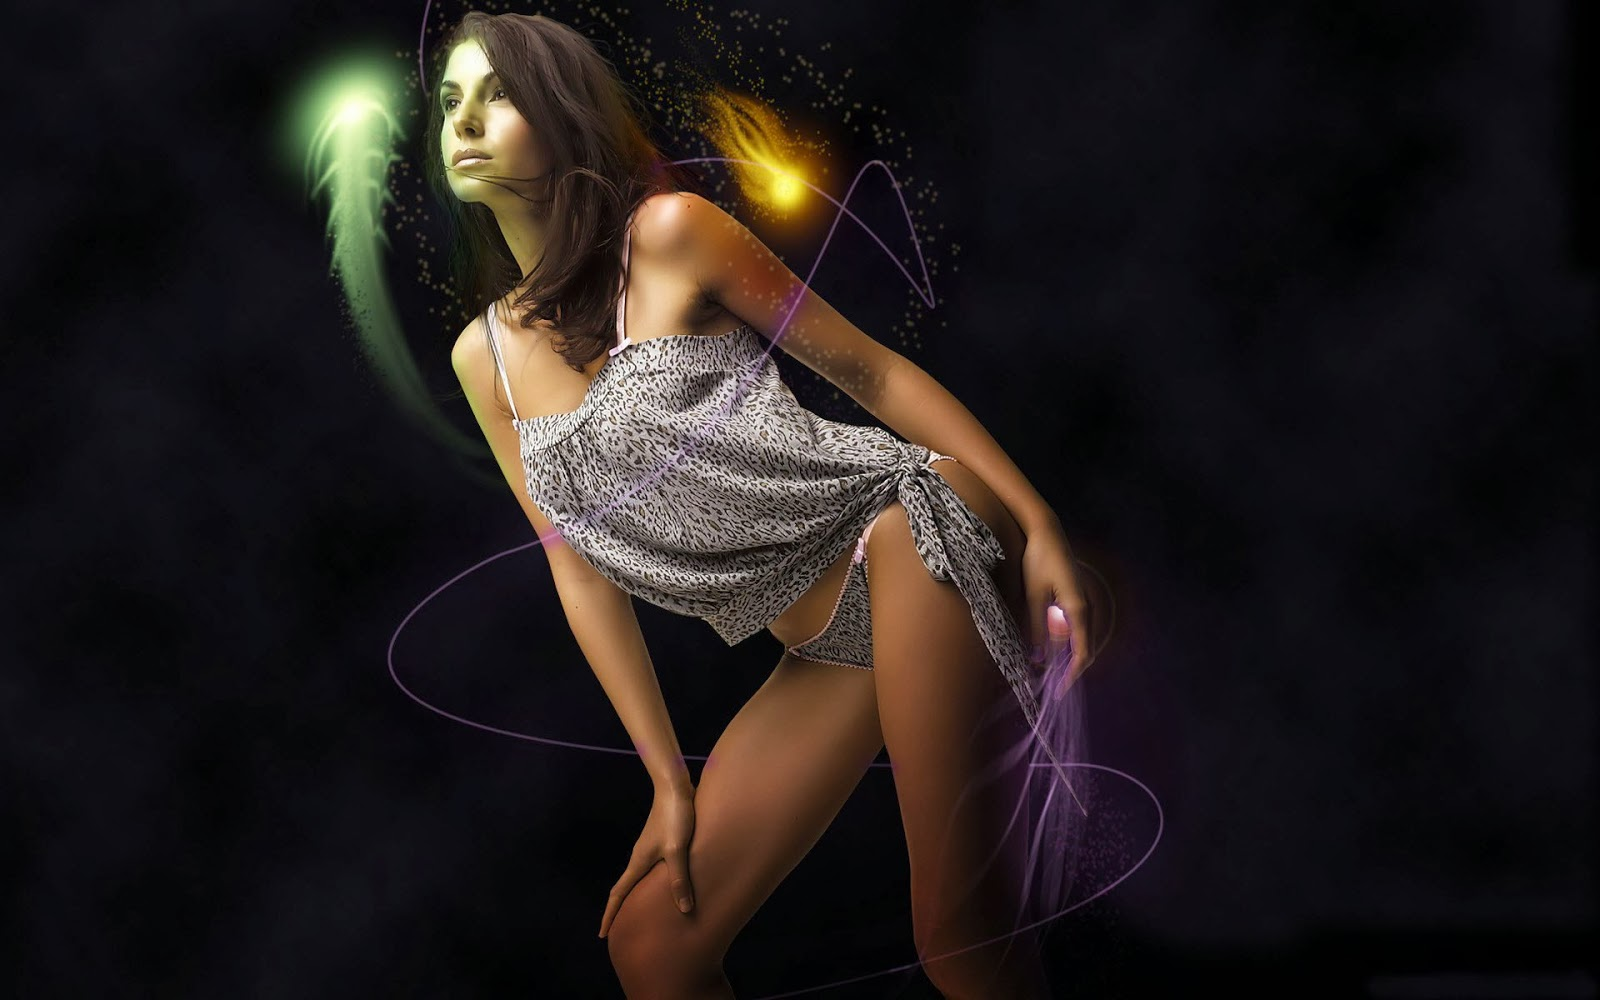 Fantasy girls wallpapers hd 3d hd wallpapers - Fantasy desktop pictures ...